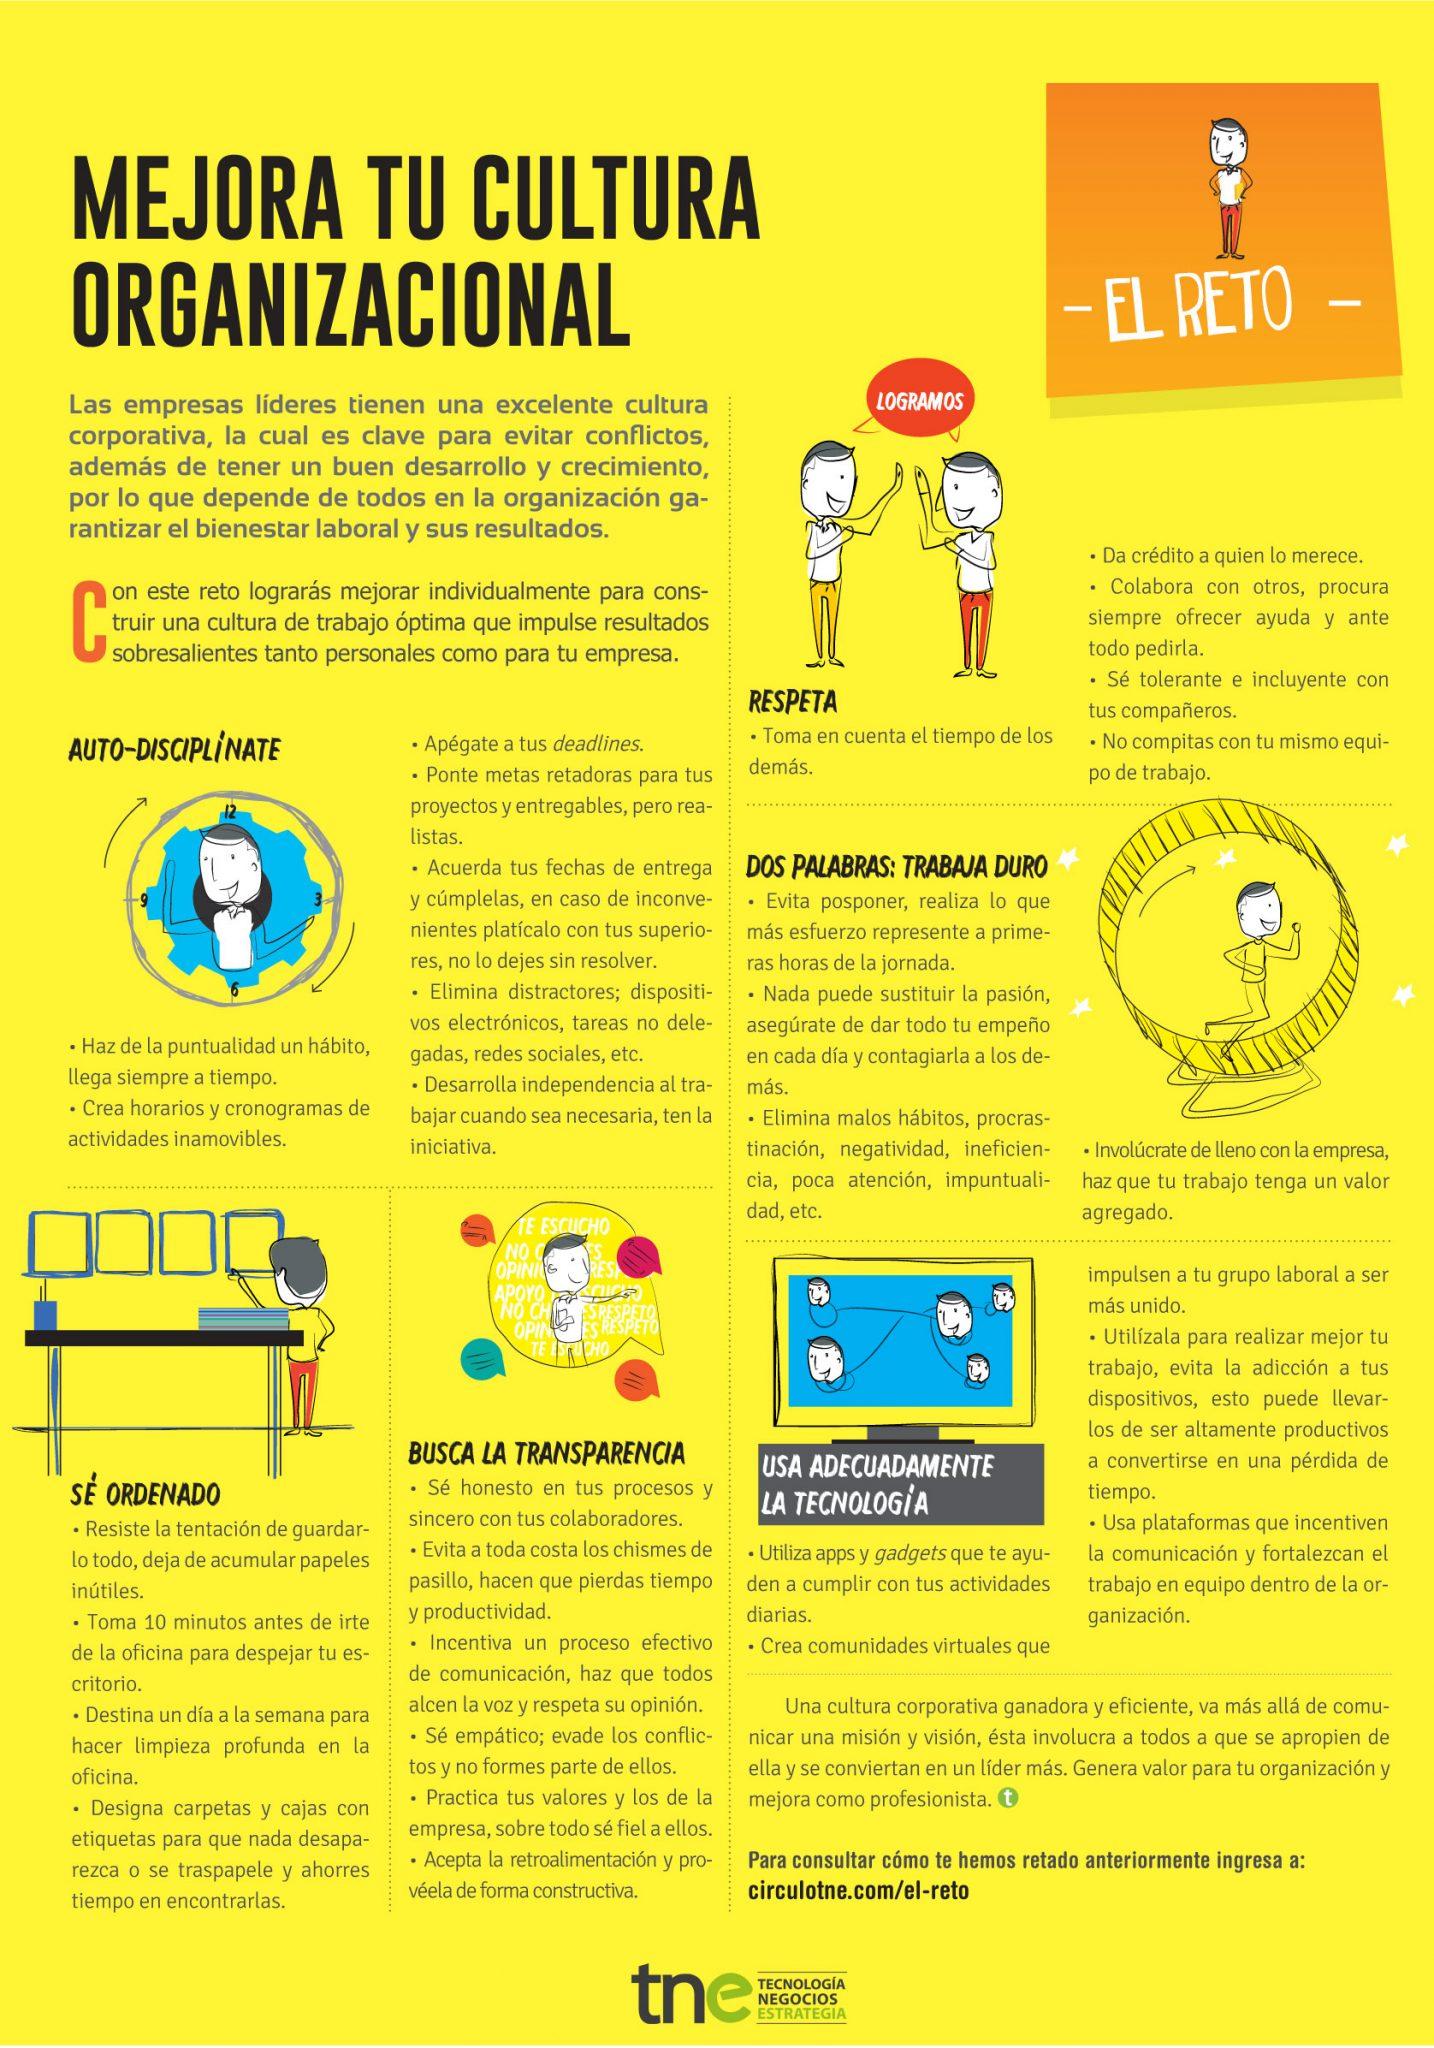 mejora-tu-cultura-organizacional-pagina